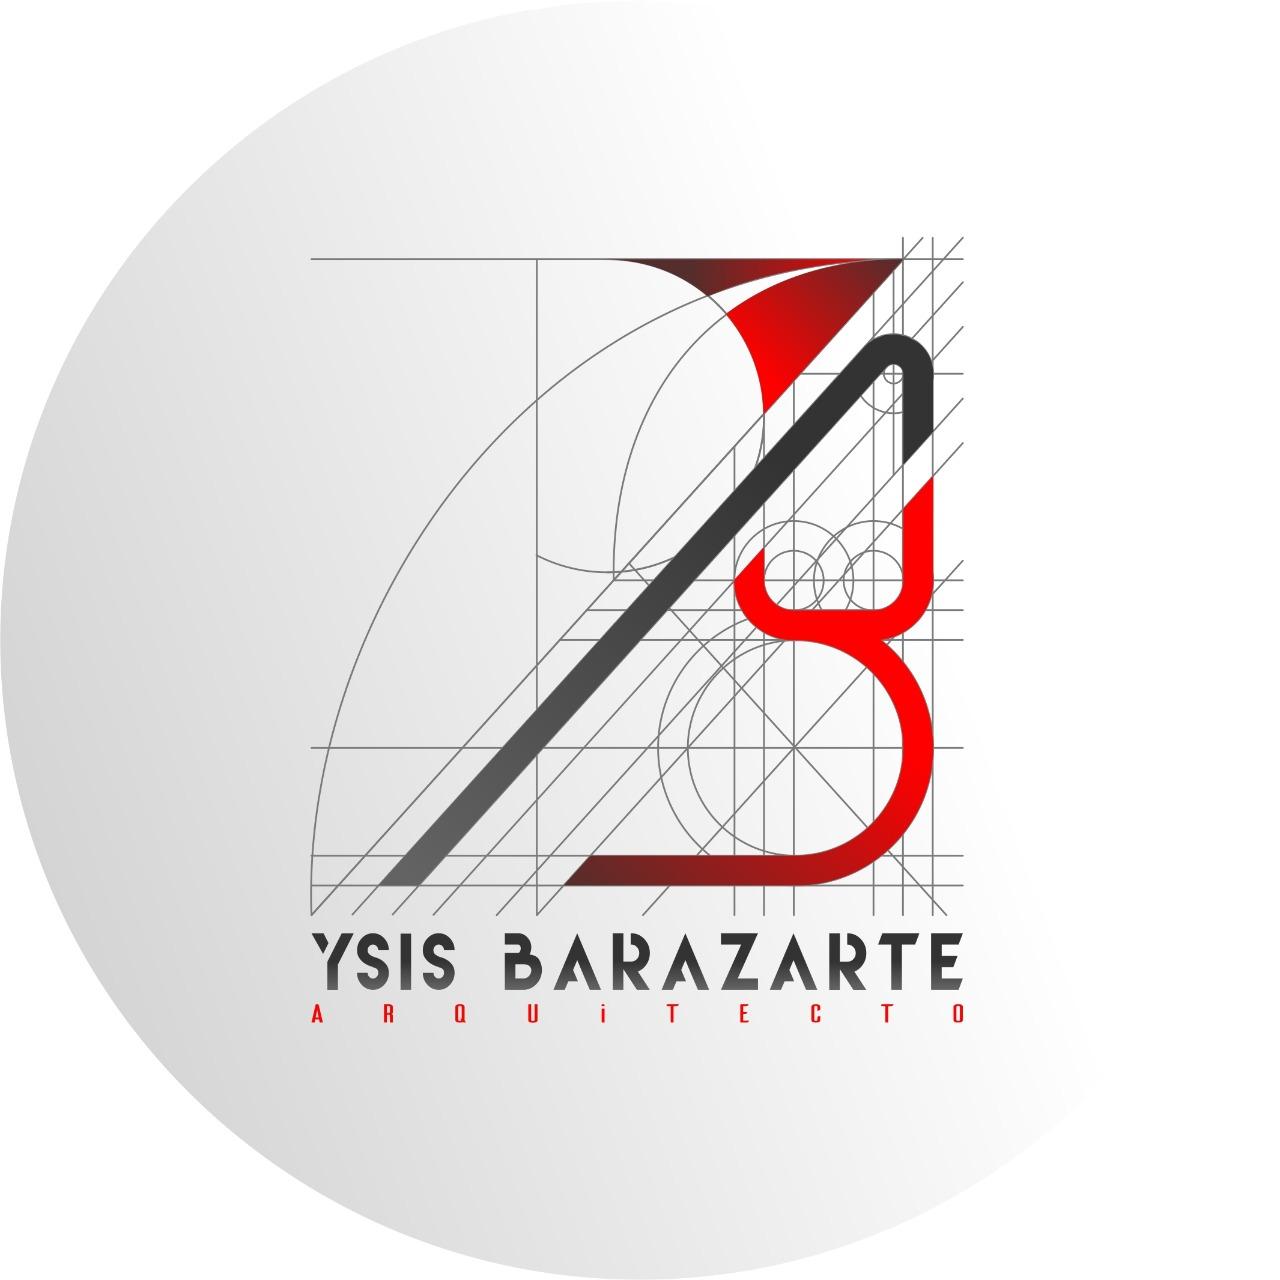 Ysis Barazarte